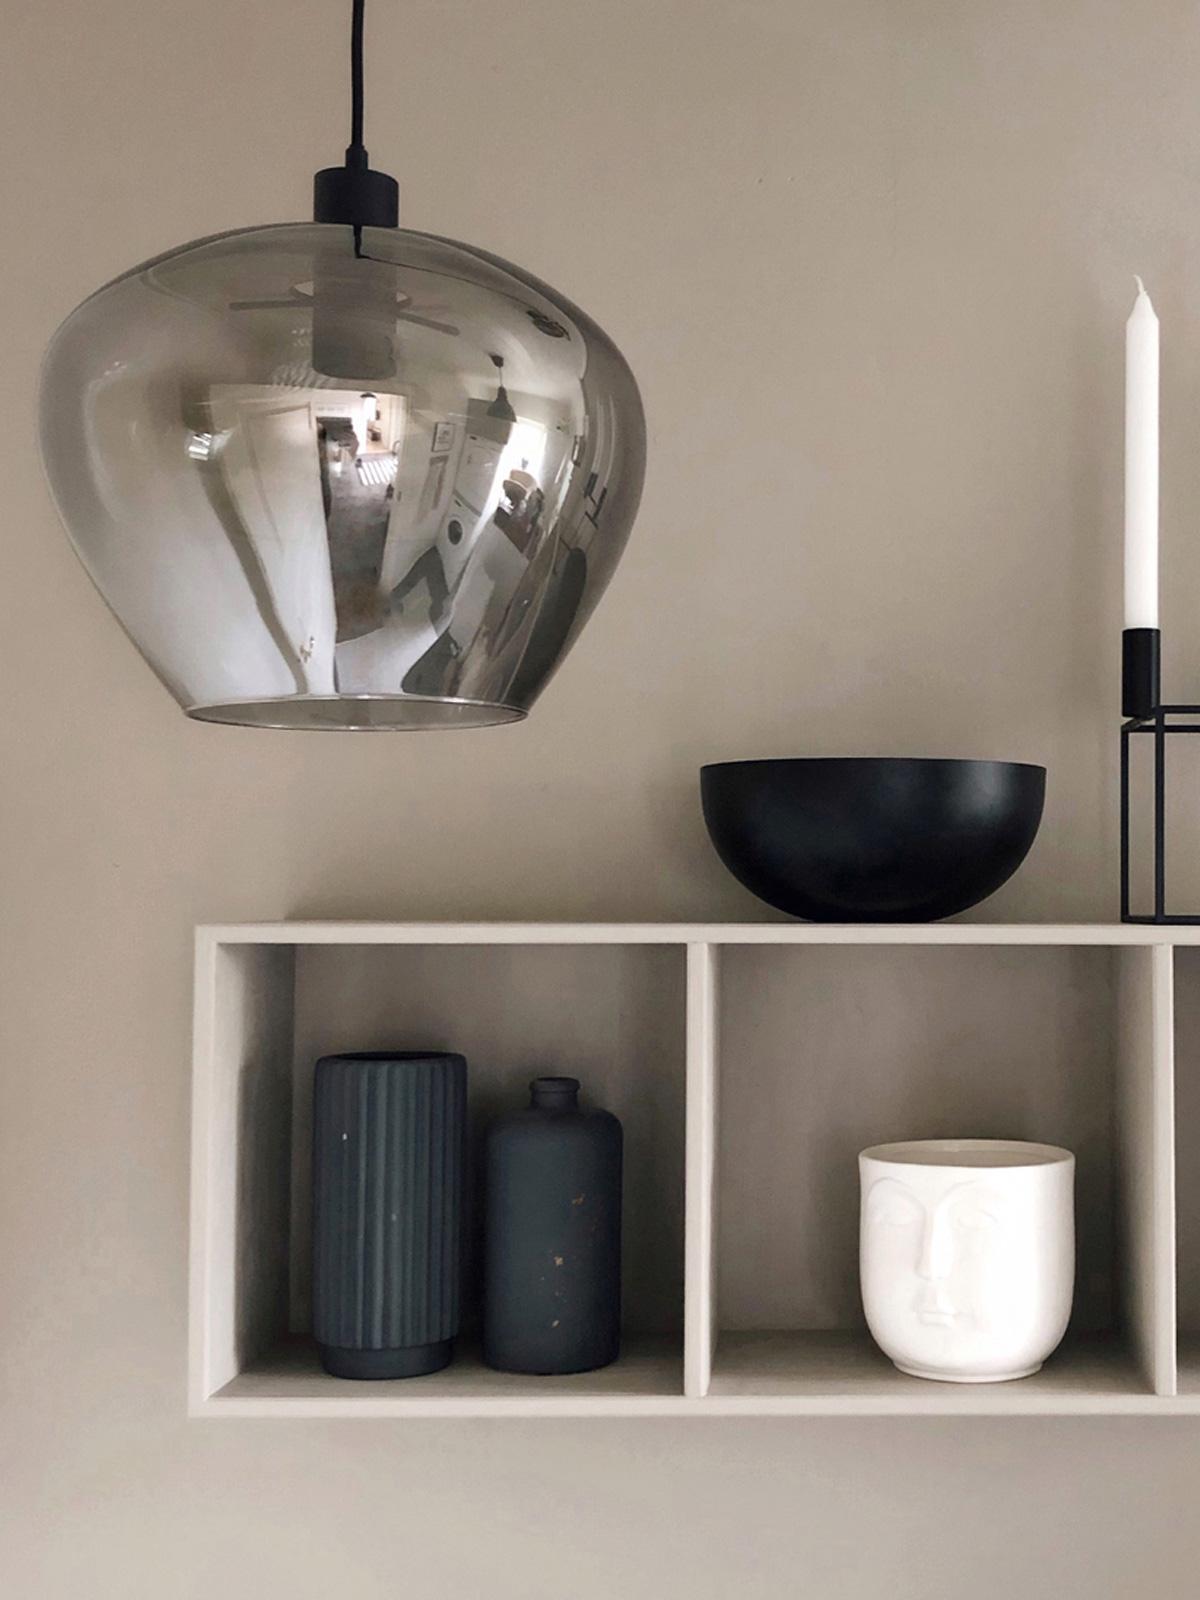 Kyoto Frandsen Glasleuchte DesignOrt Onlineshop Lampen Berlin